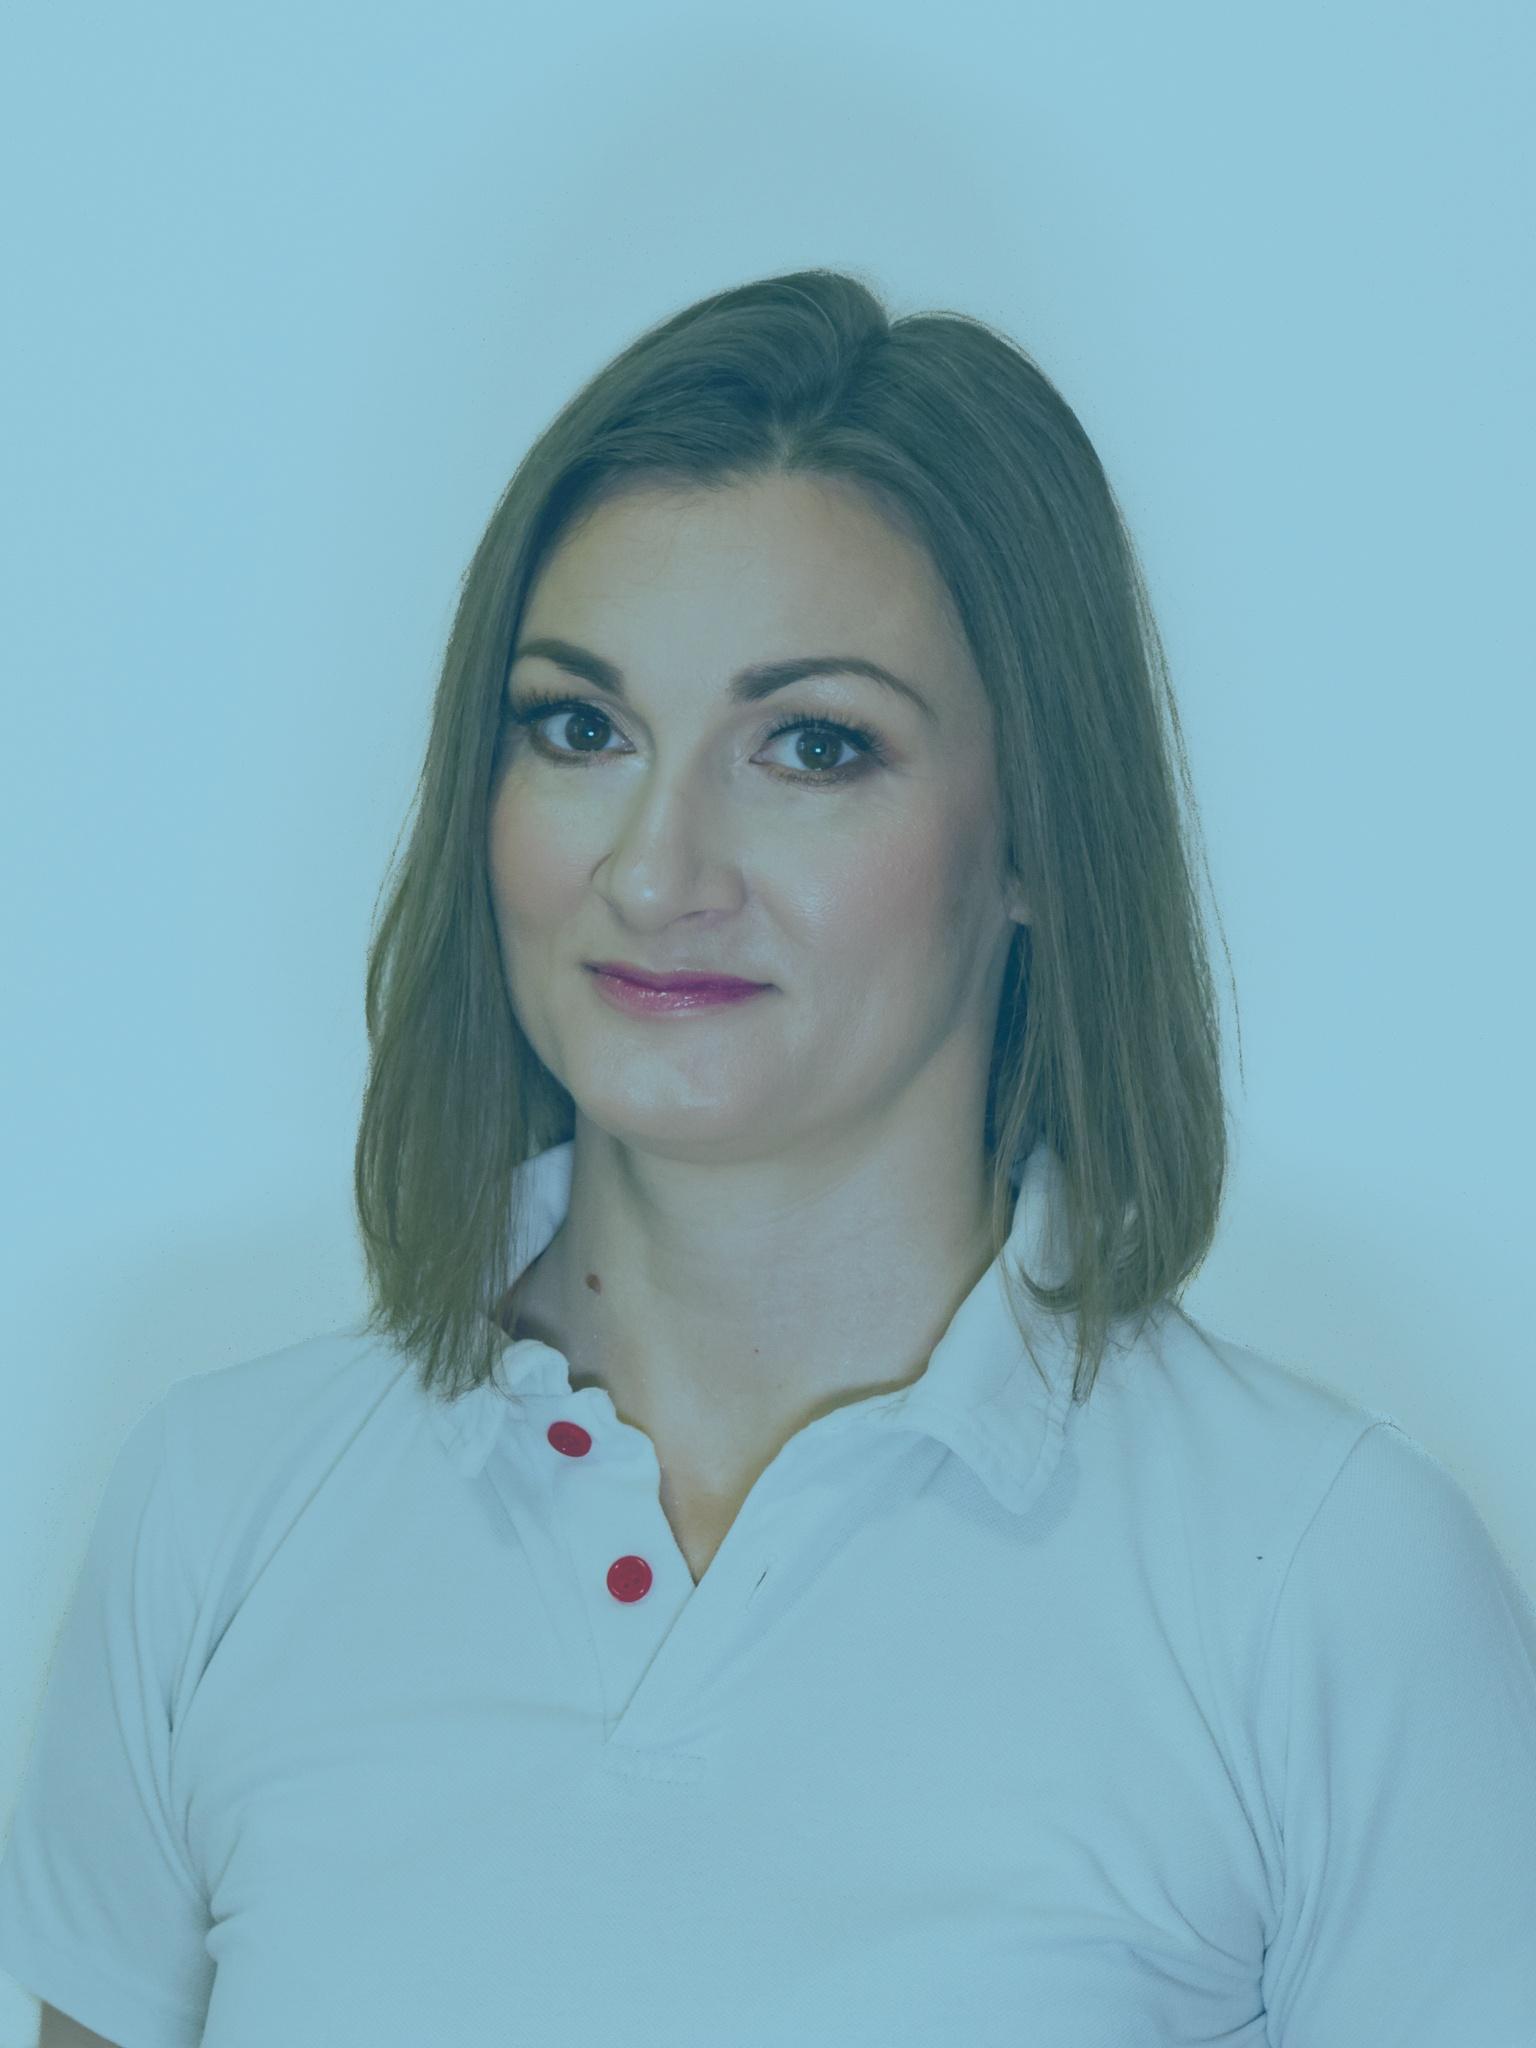 Zdenka Pavišić